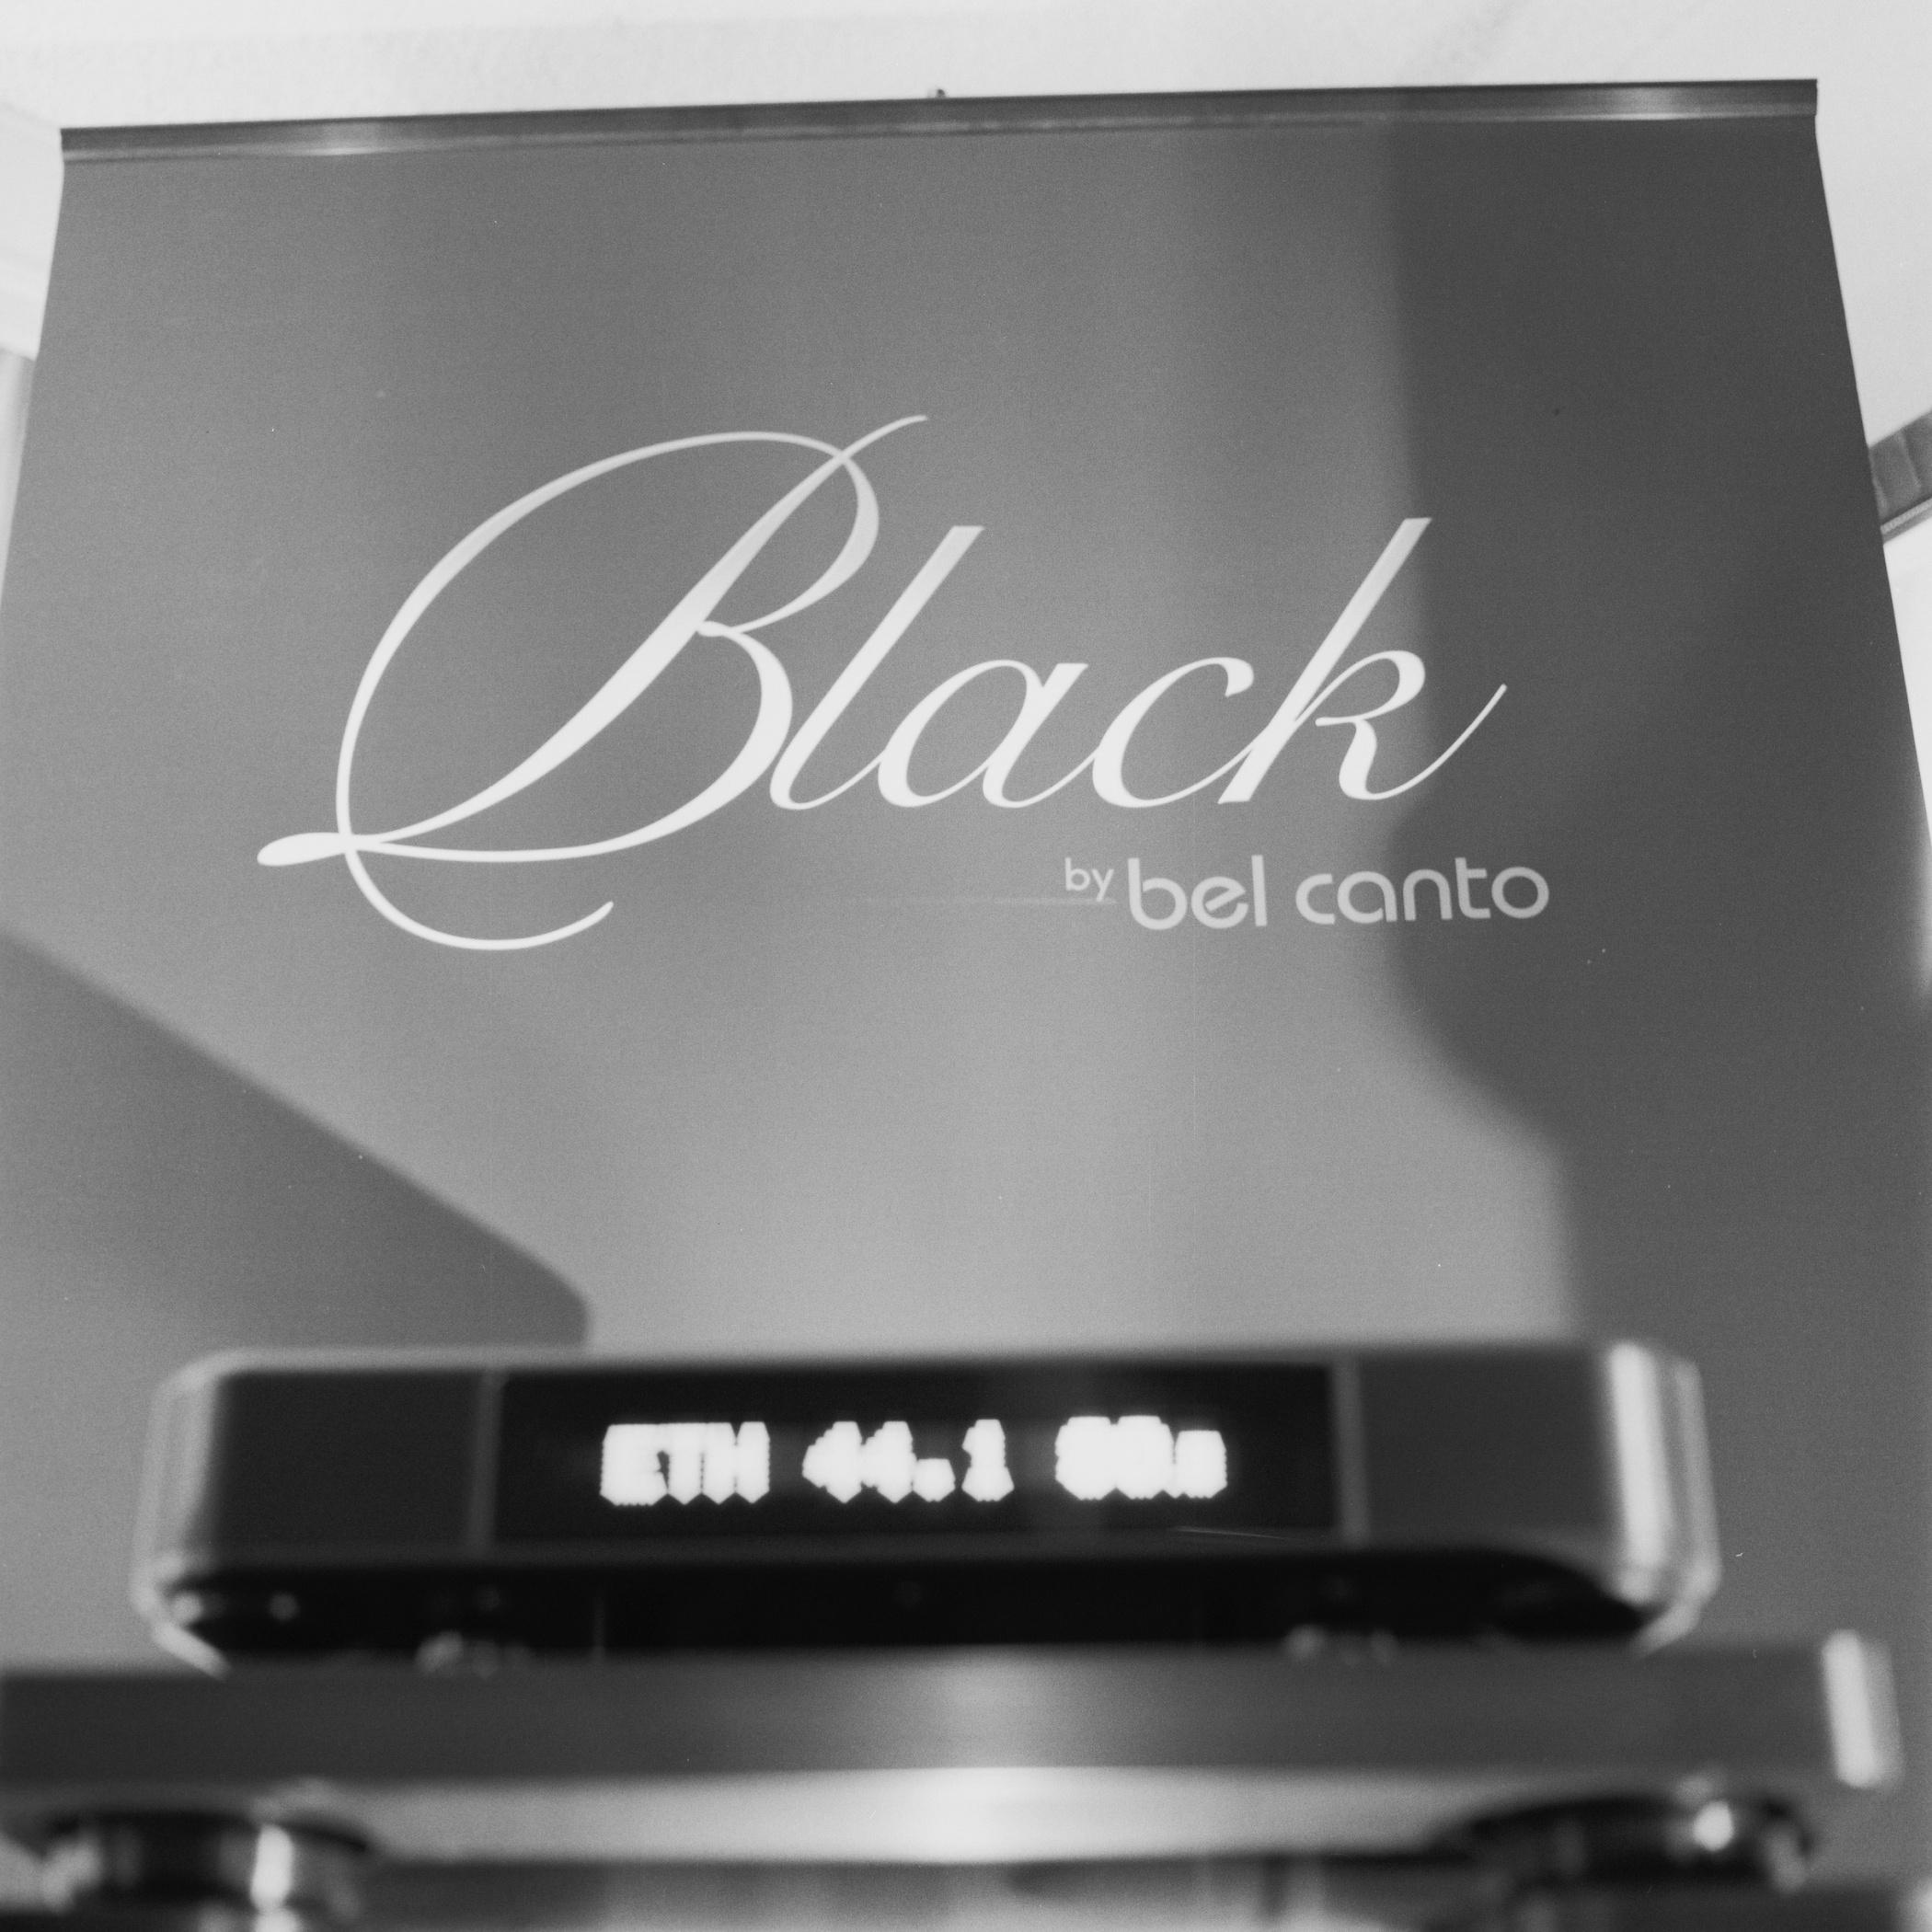 2013-Hasselblad-Black-02